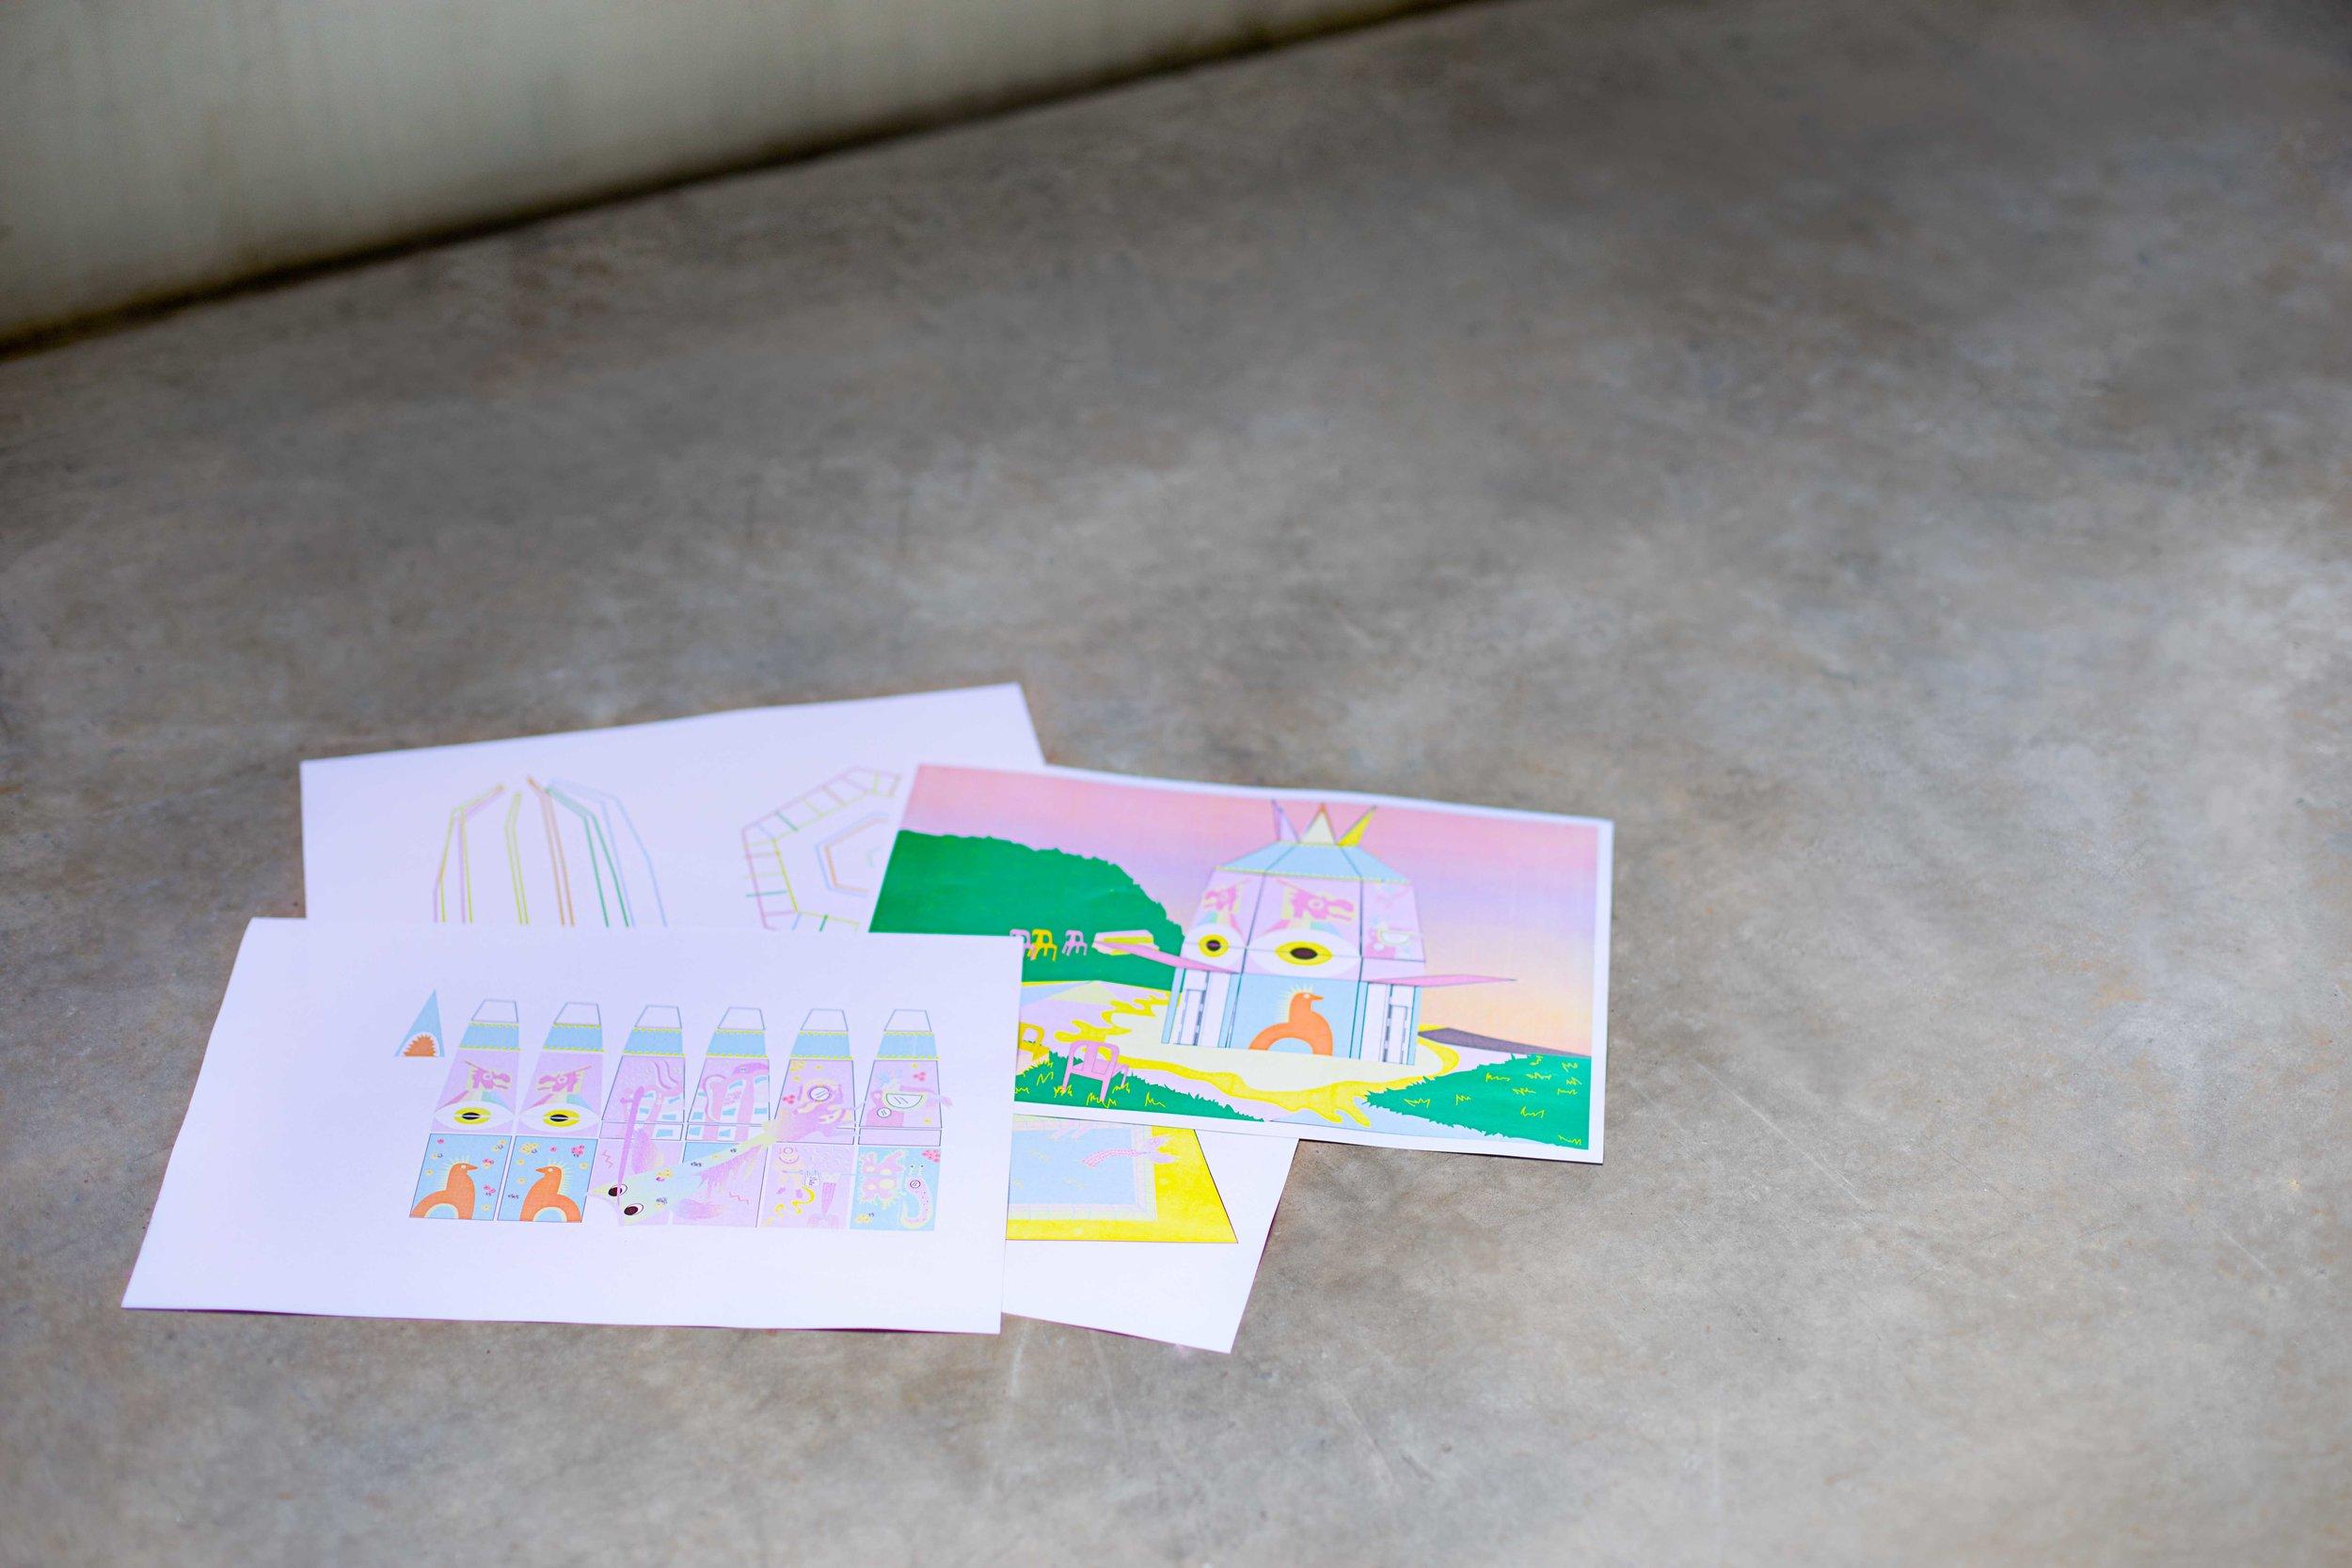 DISINI-Artists_Shoot-Mash_Up-UNIFORM-25012018-Web_Ready-10.jpg